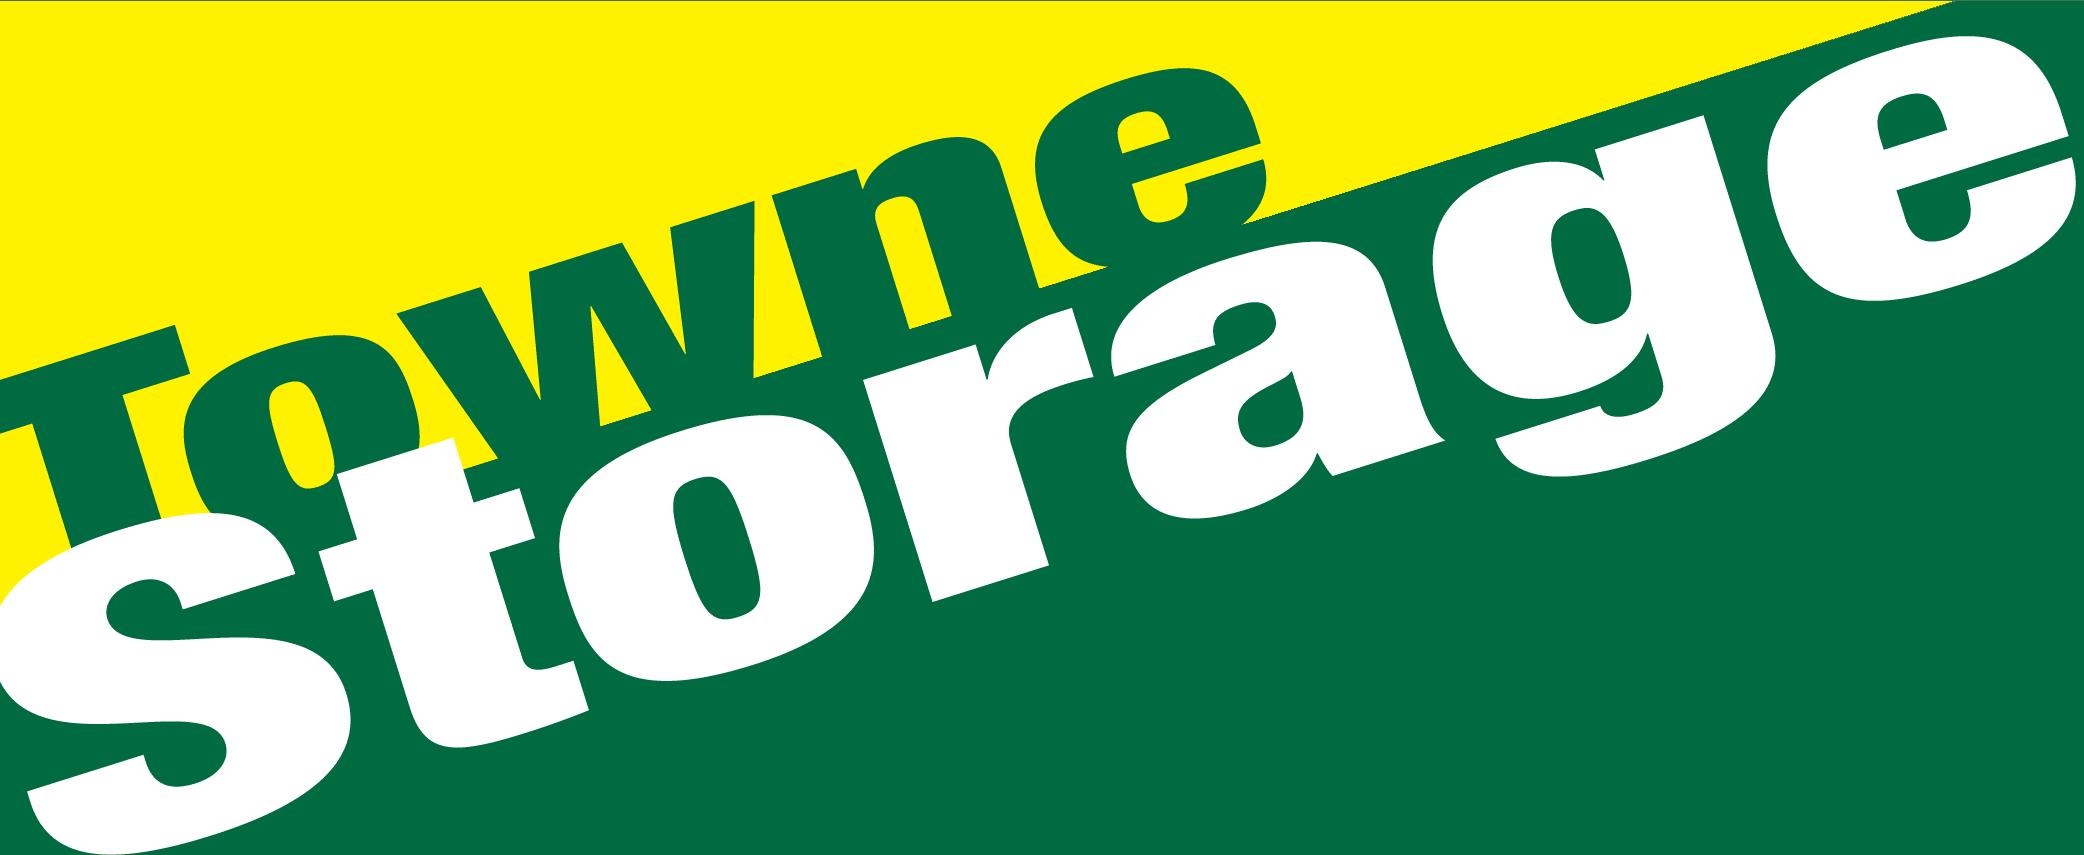 Towne Storage - Colt Plaza logo